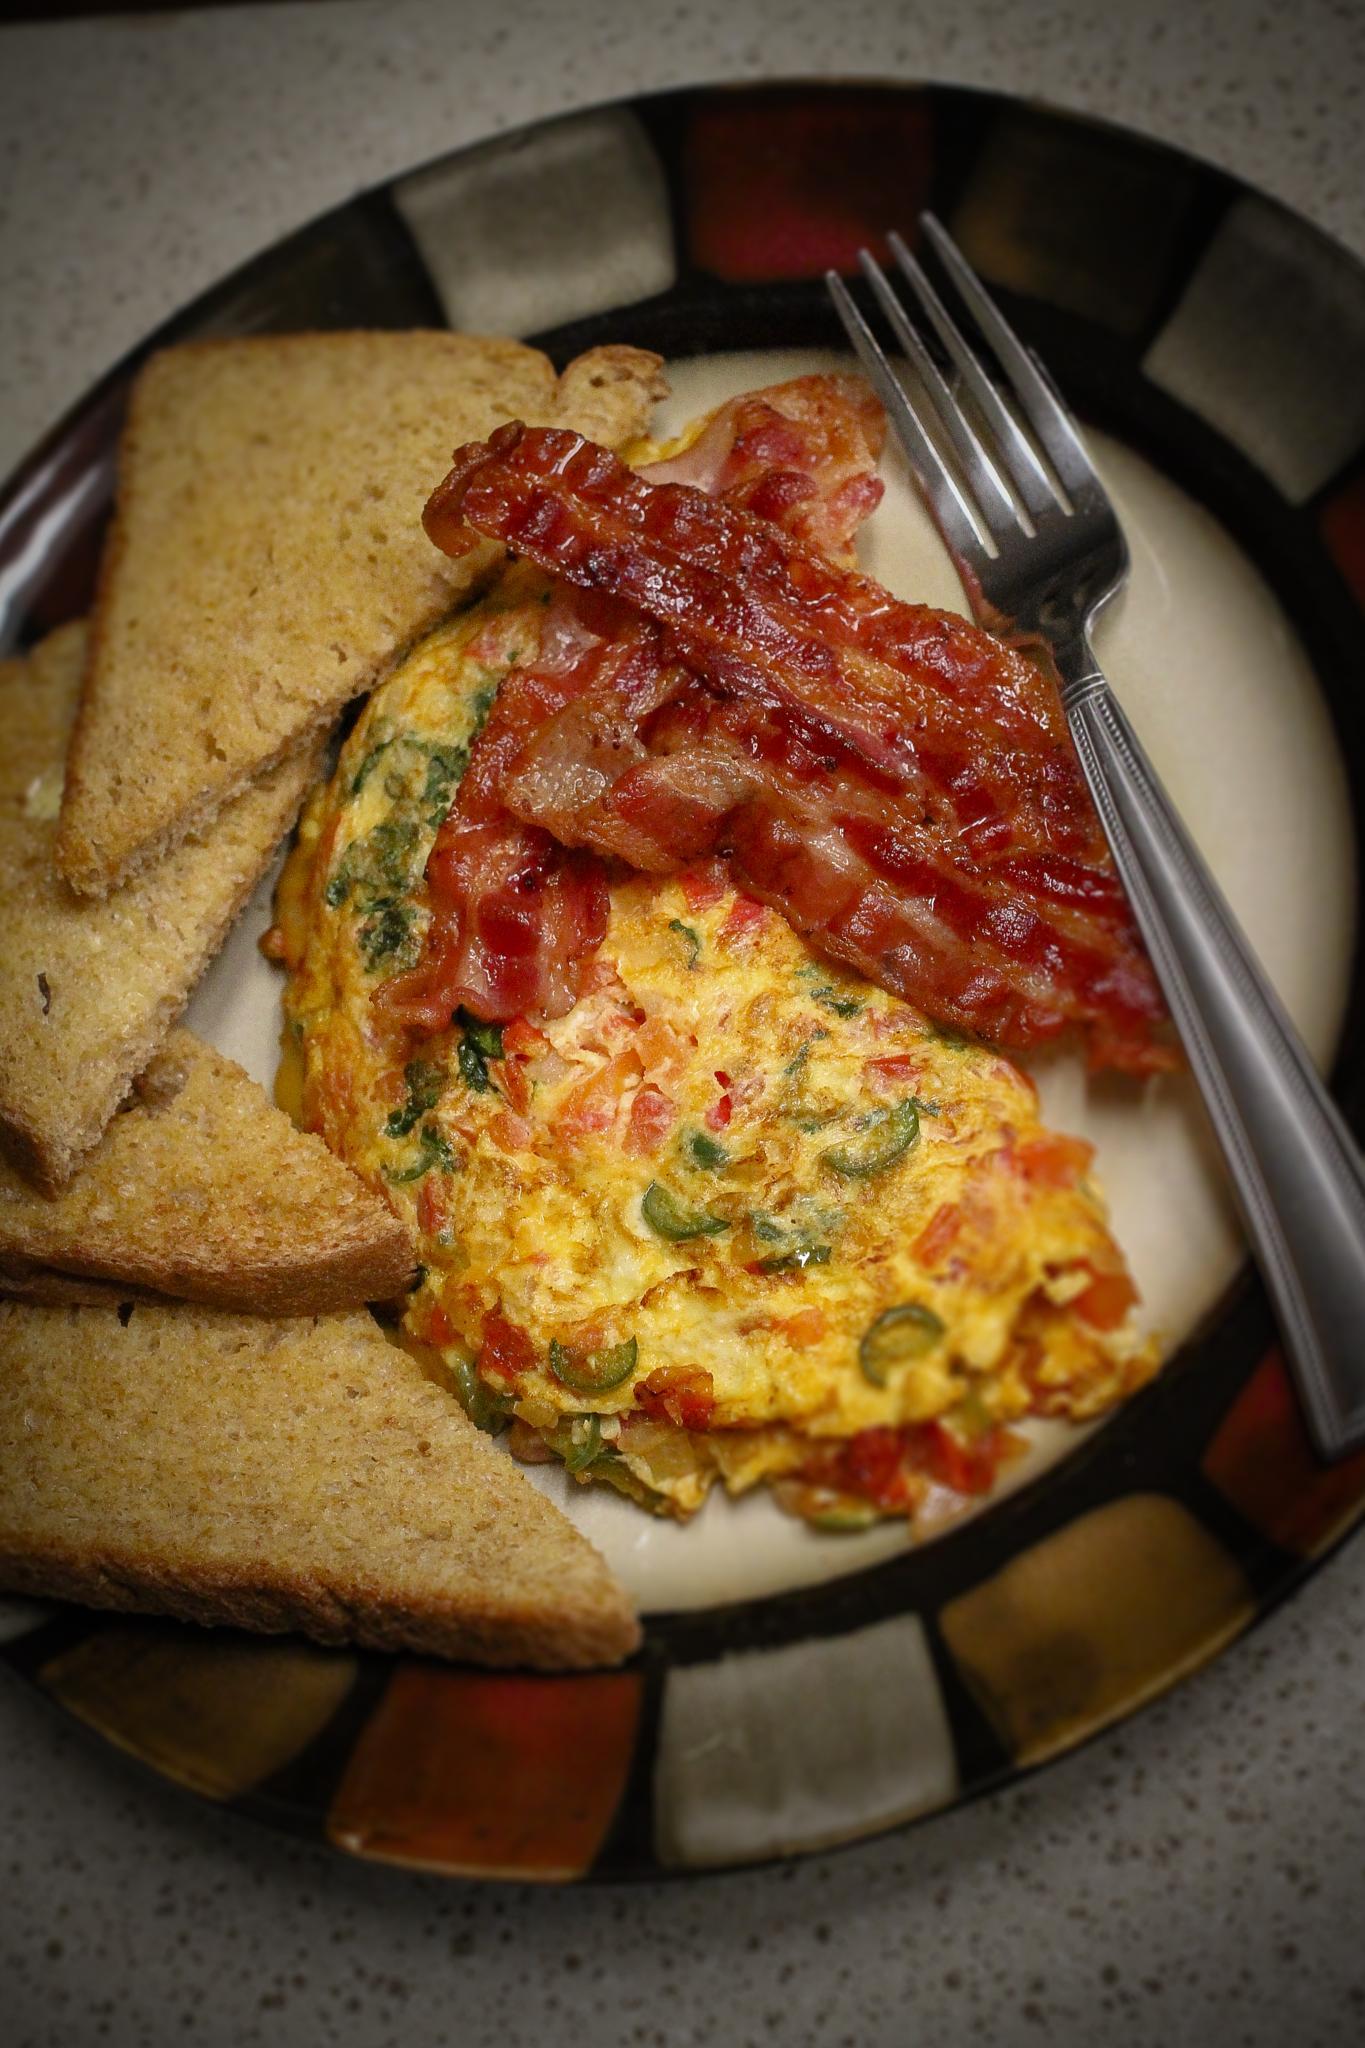 Omelette Ready to Eat by Adela Garza Mendoza